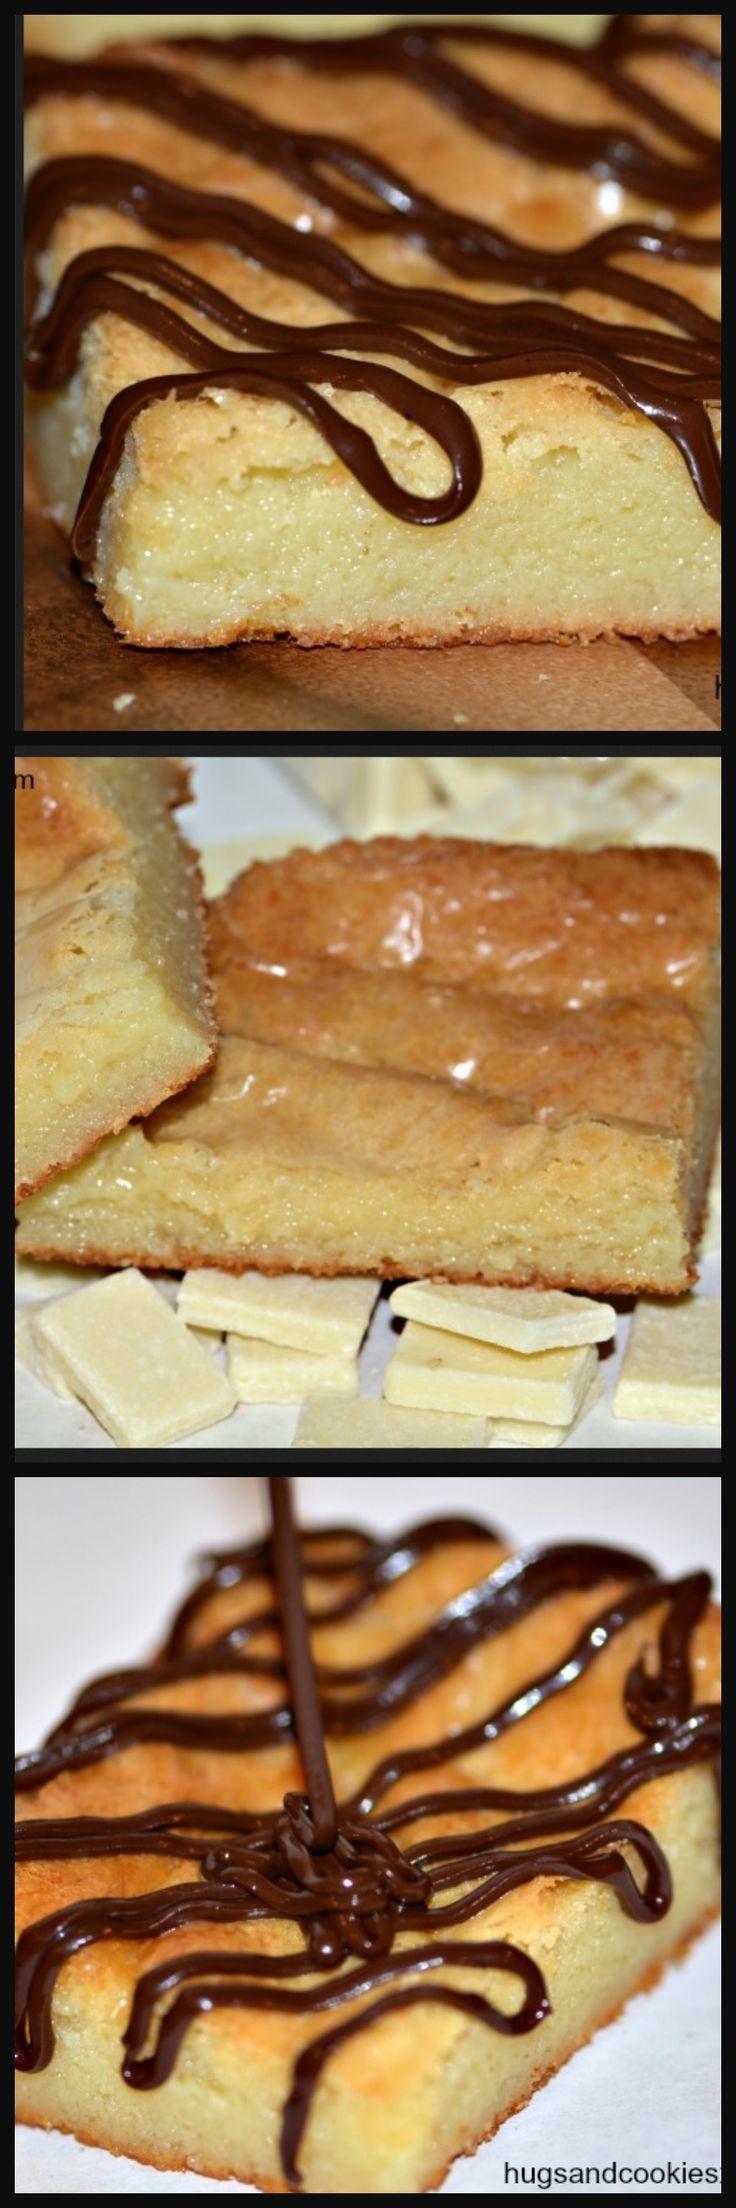 8 best something sweet images on Pinterest   White chocolate ...